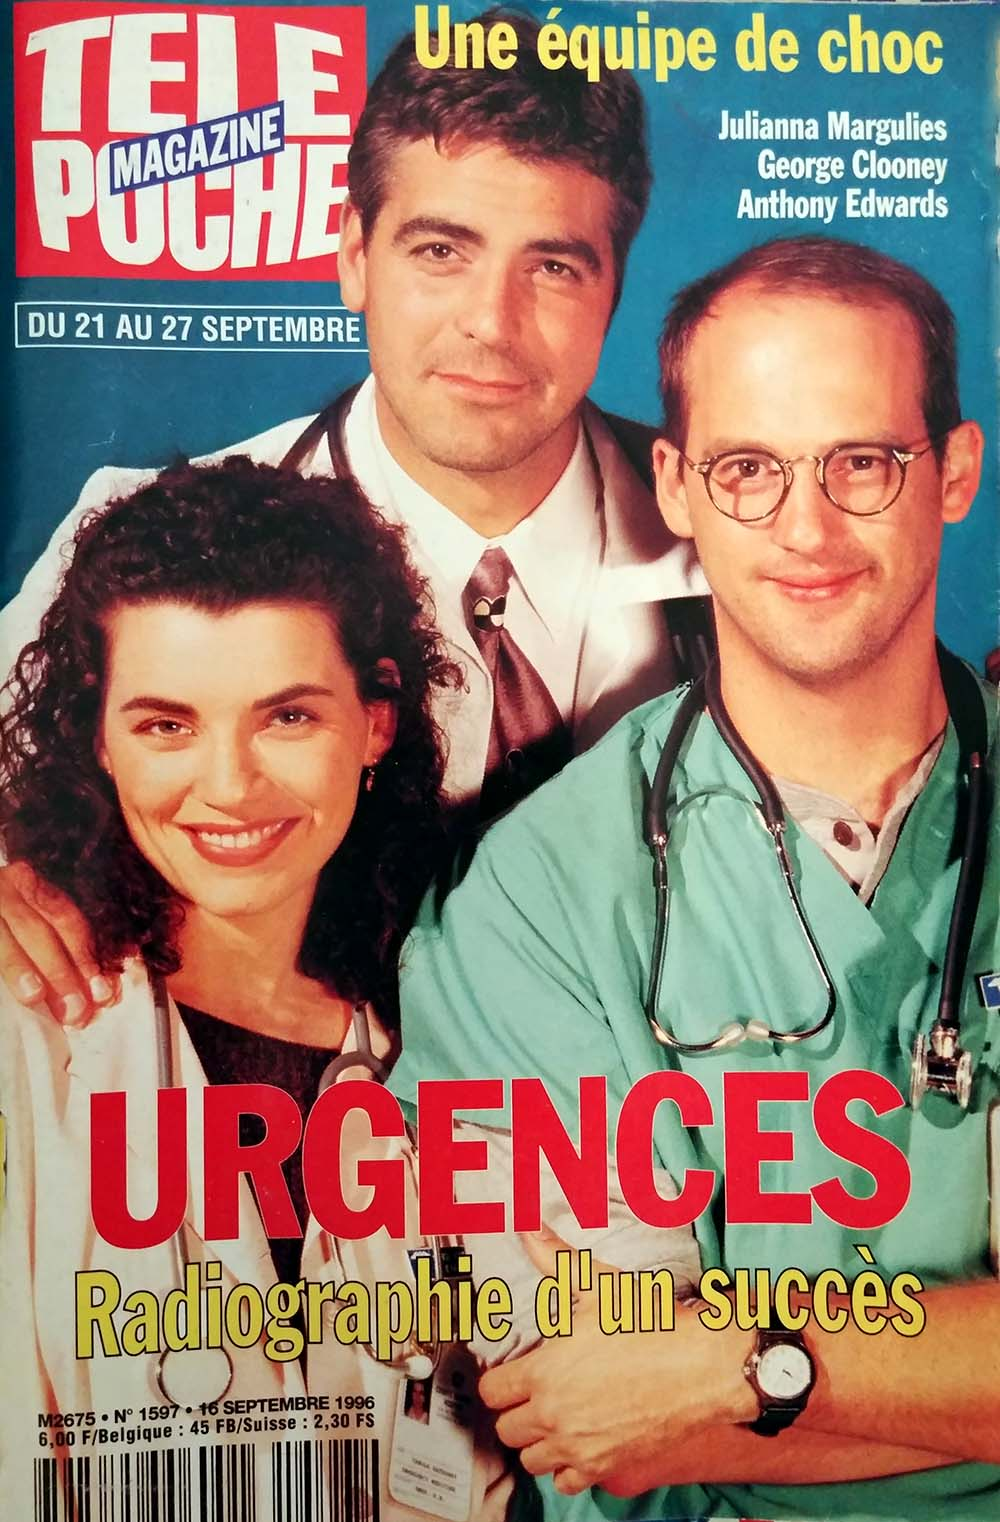 21 au 27 septembre 1996